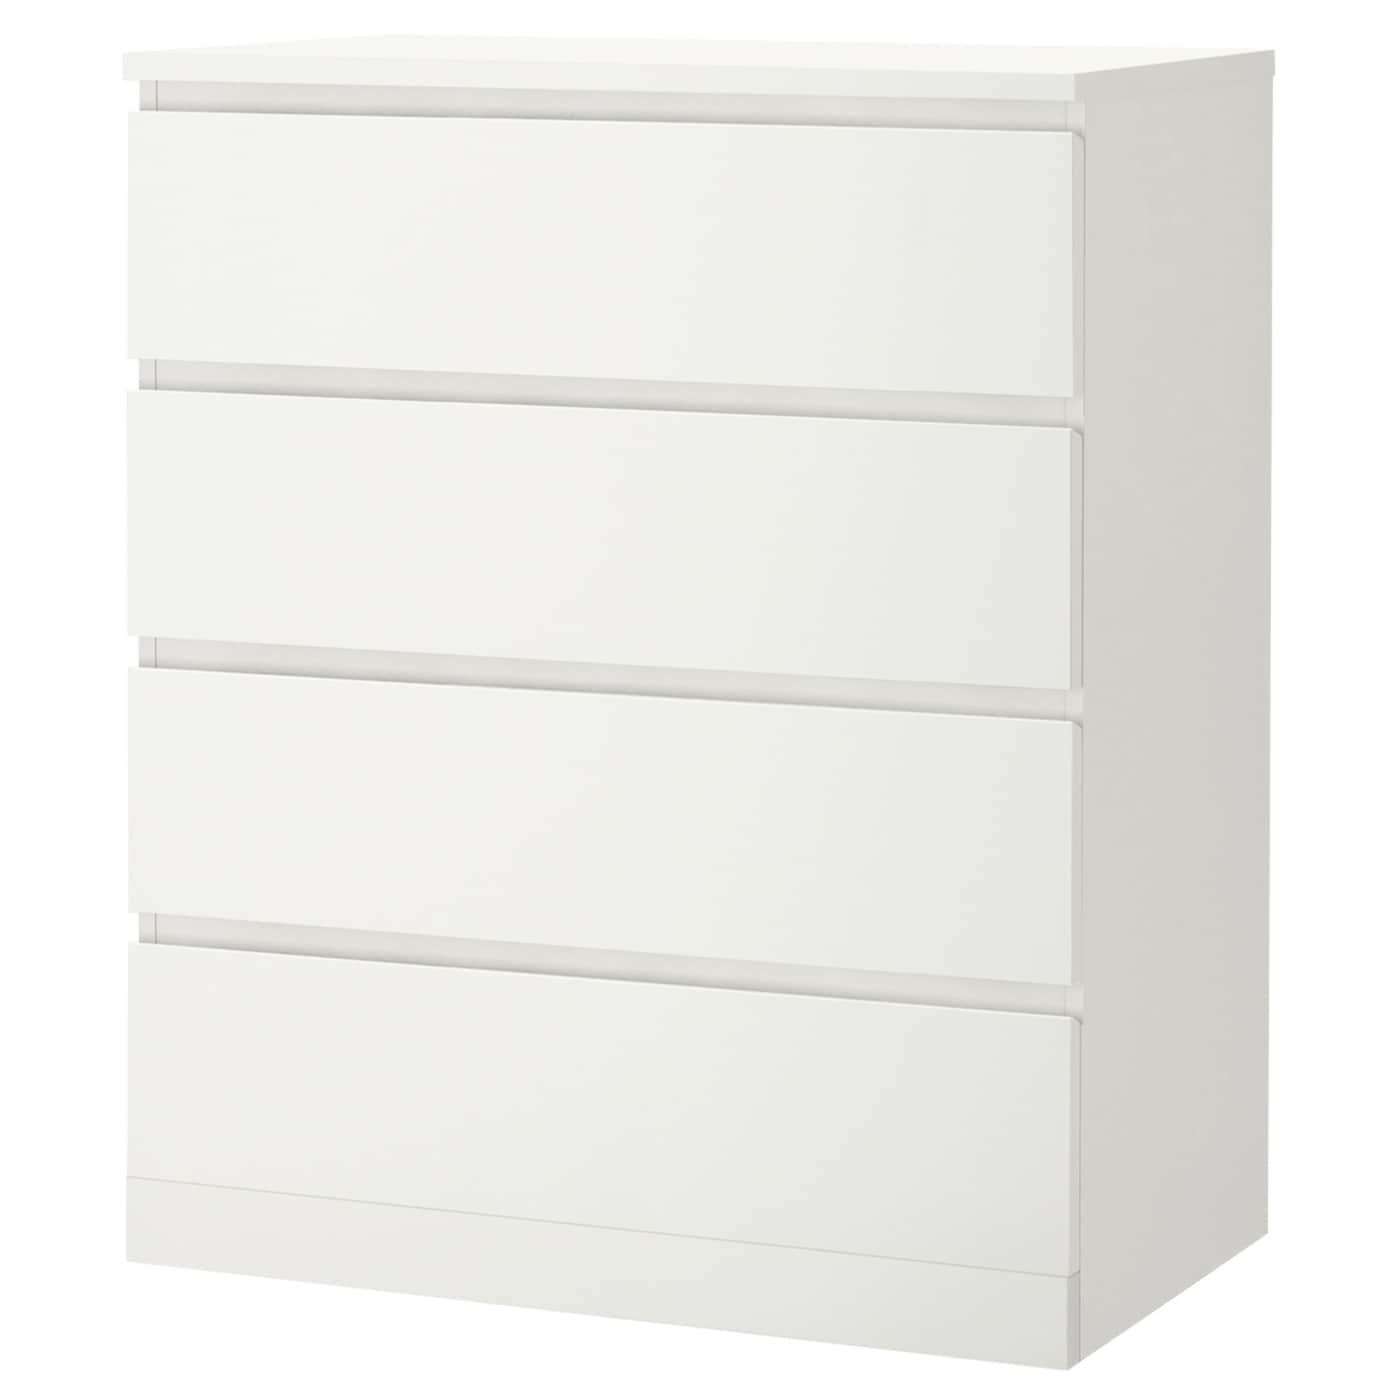 Malm 4 Drawer Chest White 31 1 2x39 3